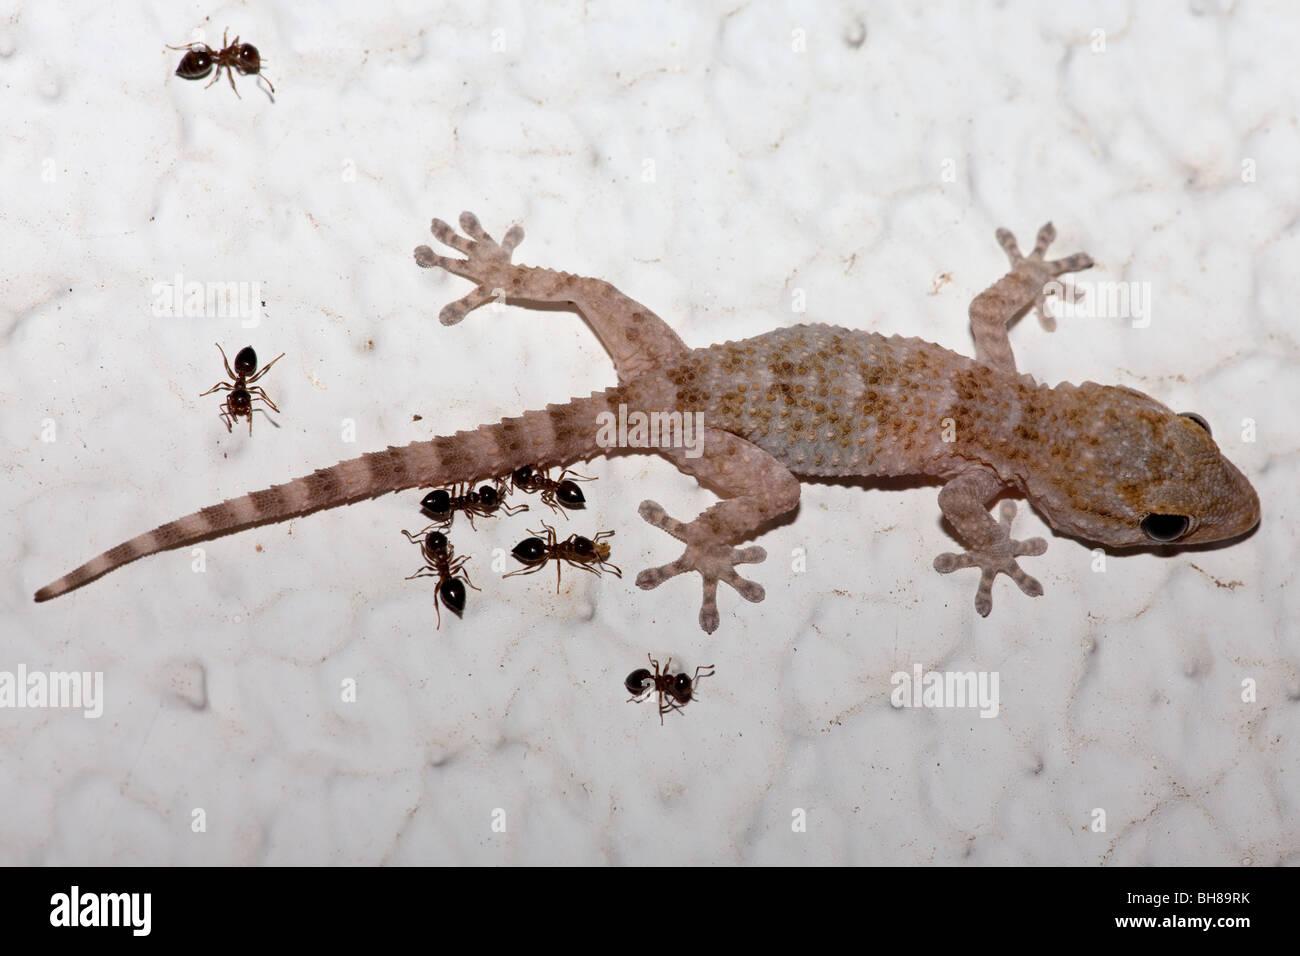 moorish wall gecko stockfotos moorish wall gecko bilder alamy. Black Bedroom Furniture Sets. Home Design Ideas